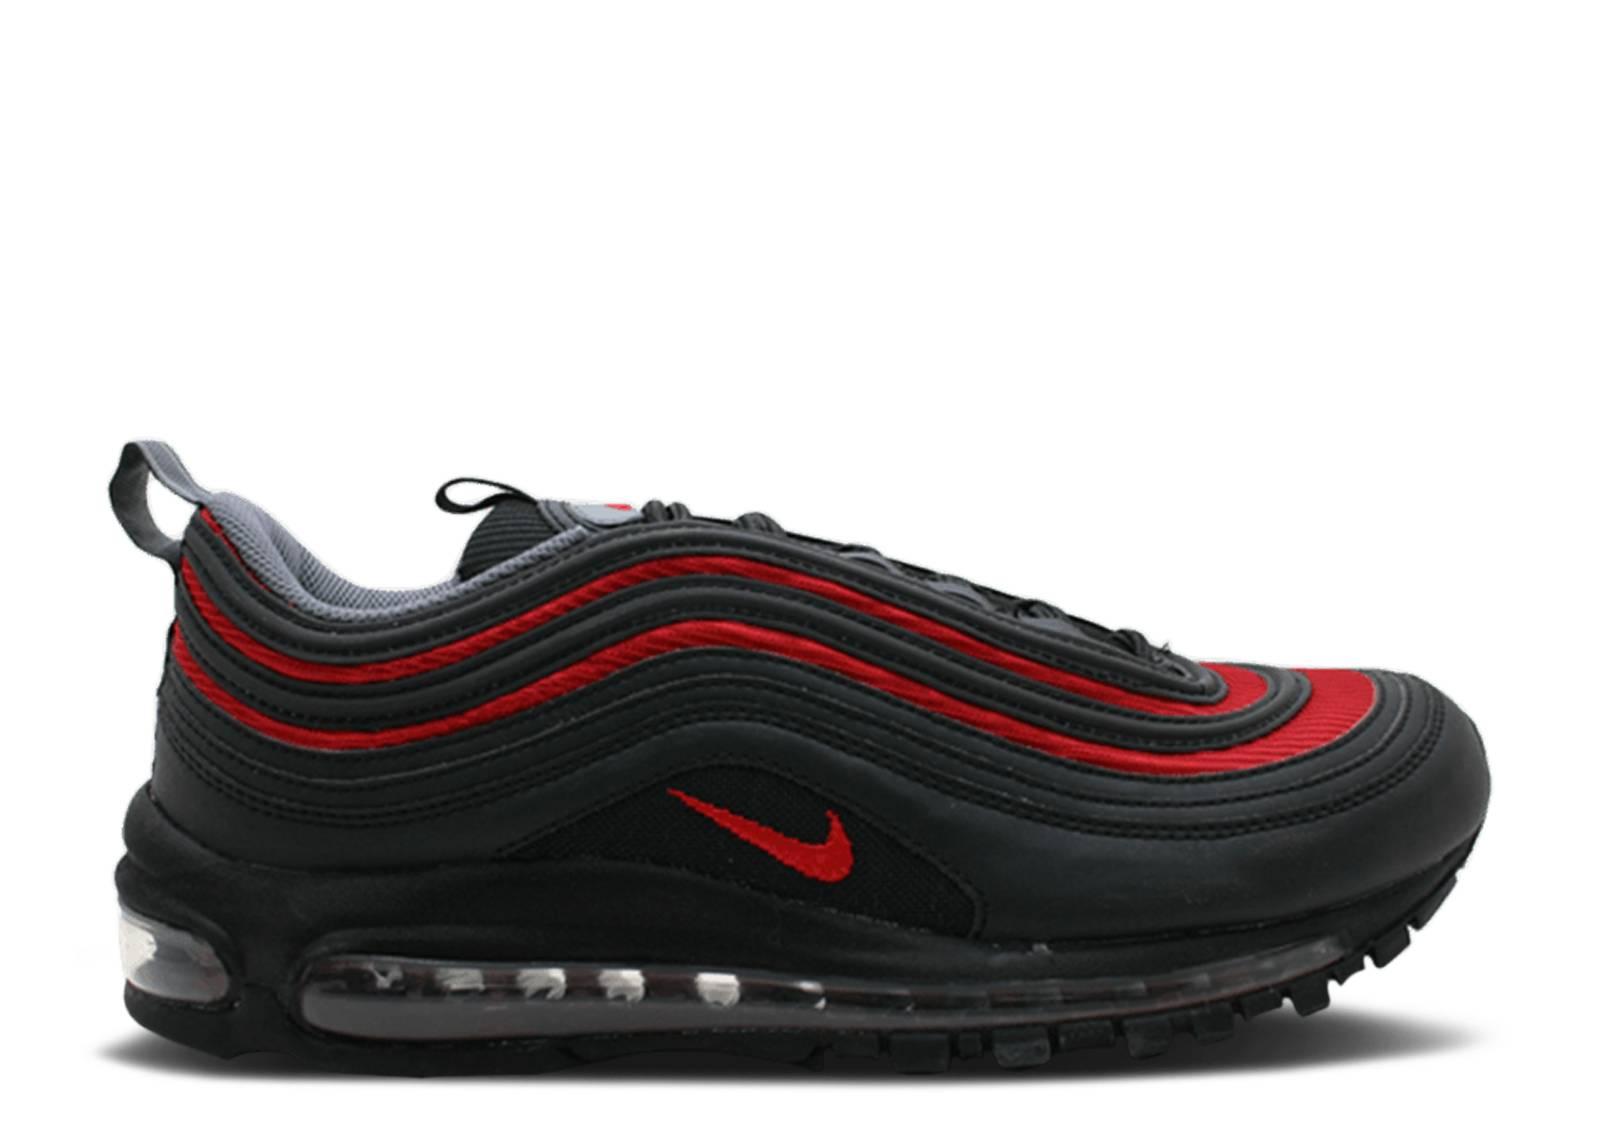 aliexpress 03ed6 a4e0c Air Max 97 - Nike - 312641 062 - black varsity red flint grey-neutral grey    Flight Club